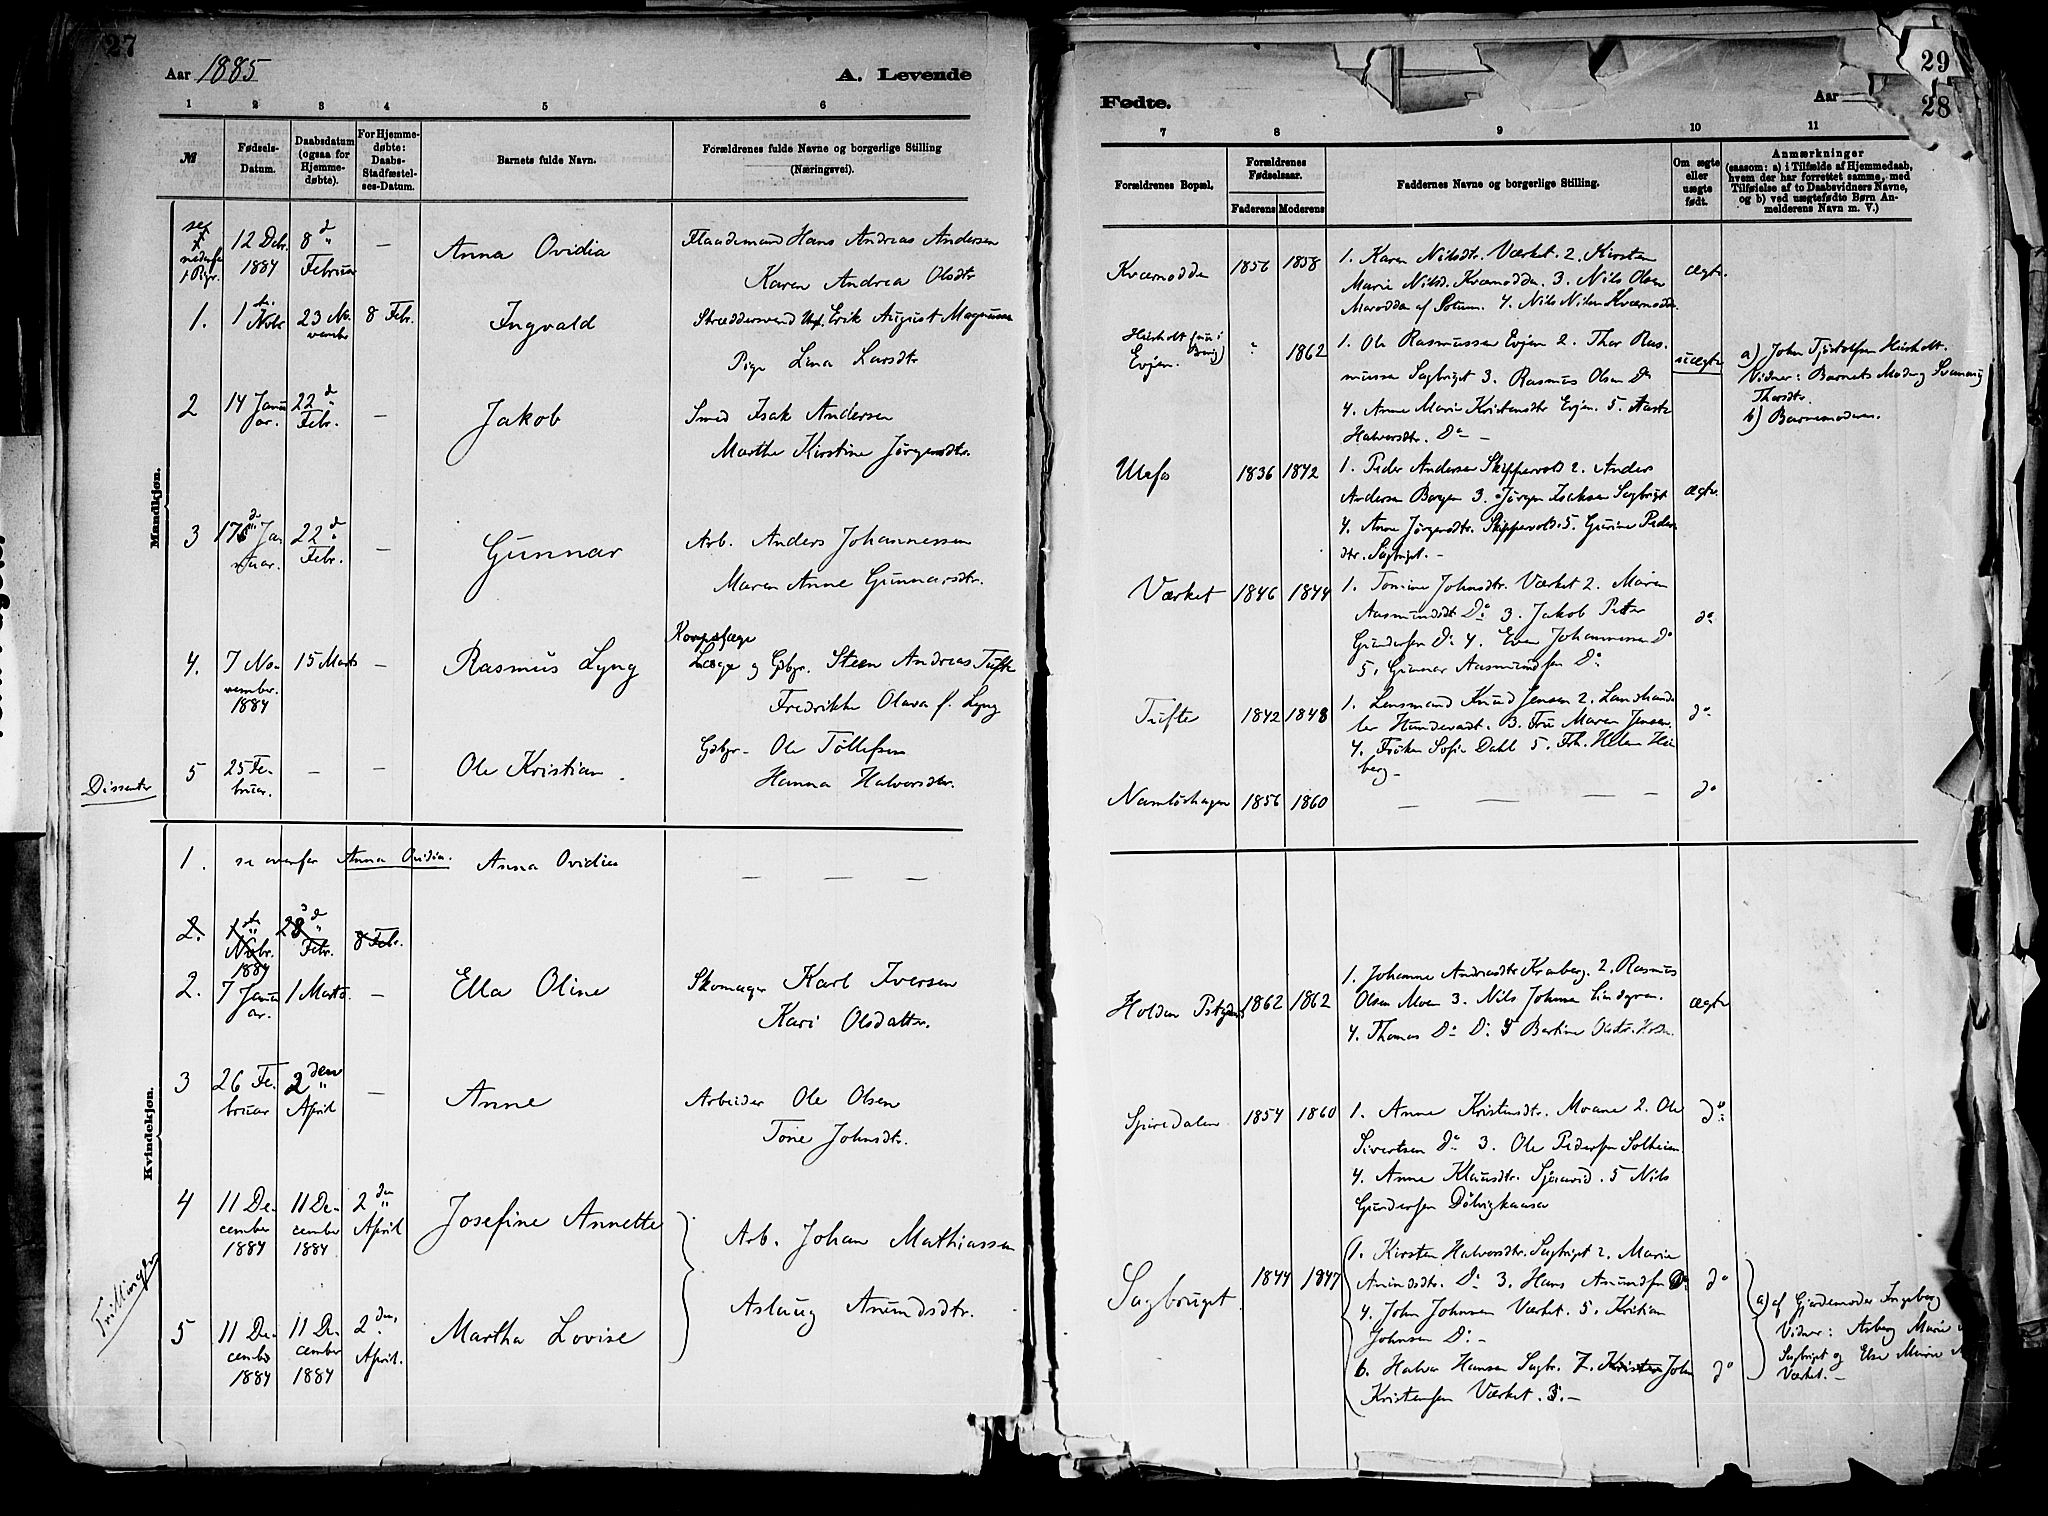 SAKO, Holla kirkebøker, F/Fa/L0008: Ministerialbok nr. 8, 1882-1897, s. 27